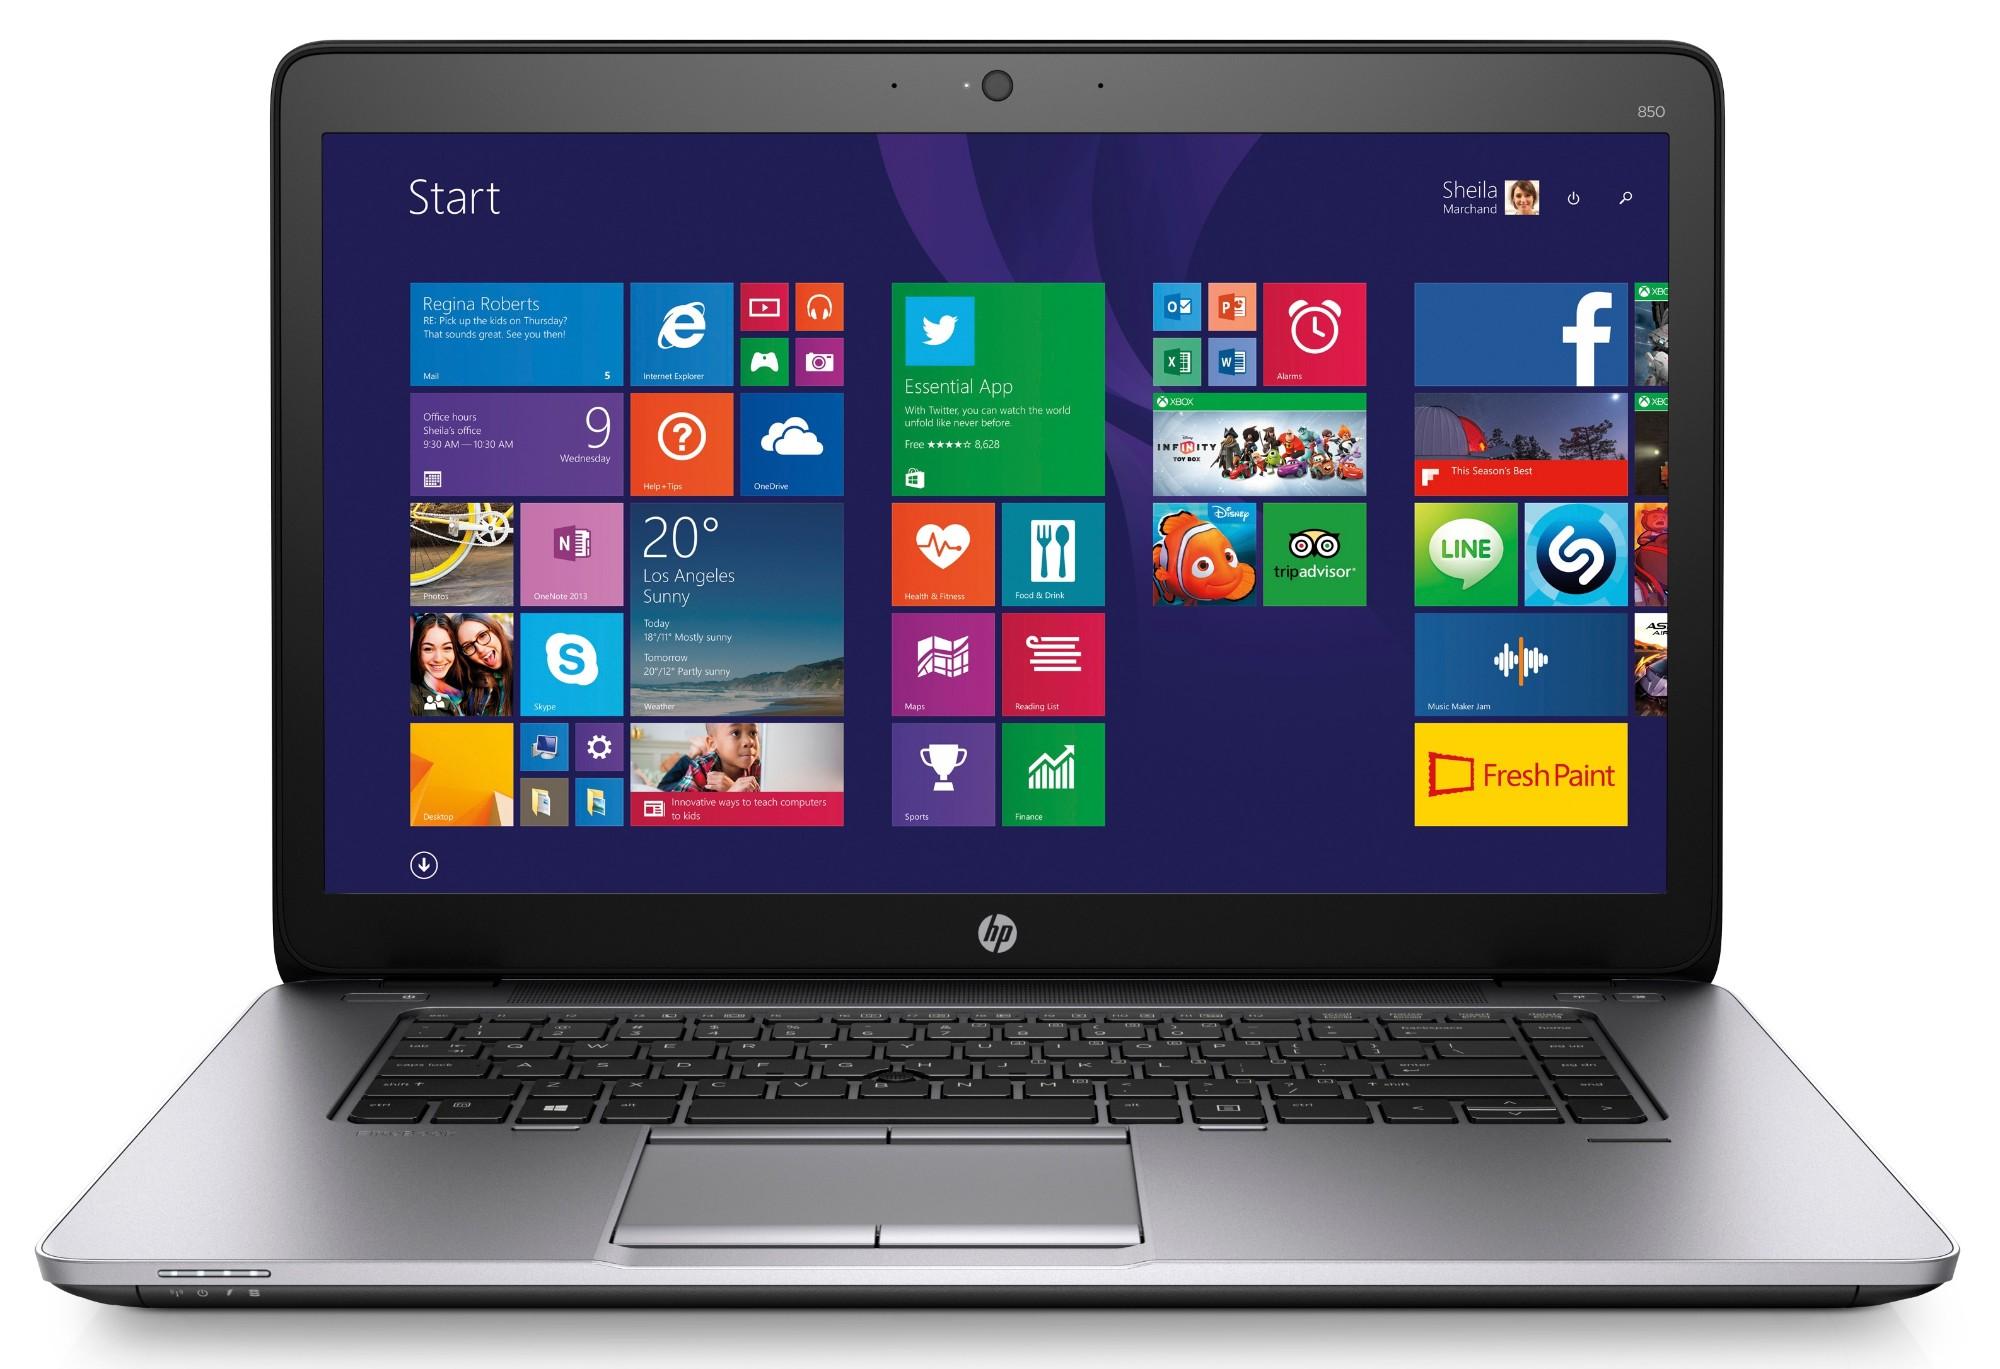 T1A HP EliteBook 850 G2 Refurbished Notebook 39.6 cm (15.6